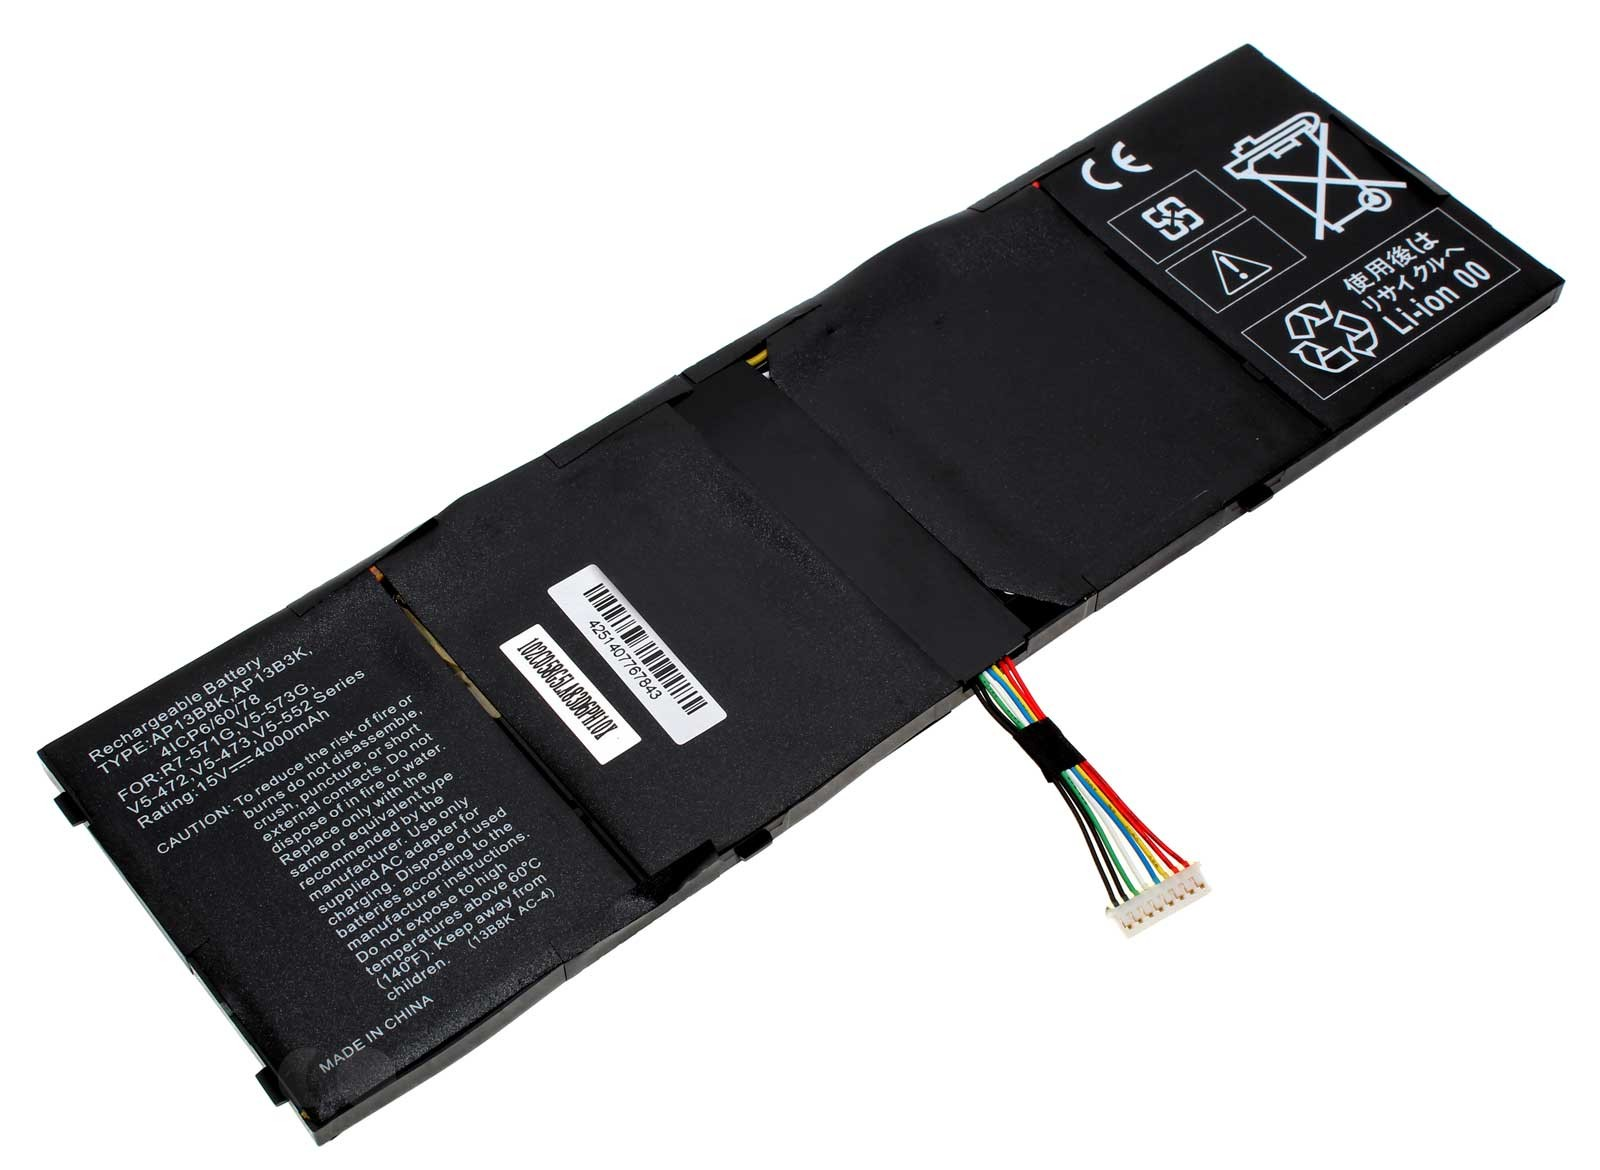 Alternativer Li-Ion Akku für Acer Laptop, Notebook mit 15 Volt und 4000mAh Kapazität. Ersetzt den original Akku 41CP6/60/78, KT.00403.013, TIS 2217-2548, AL13B3K, AP13B3K, AP13B8K